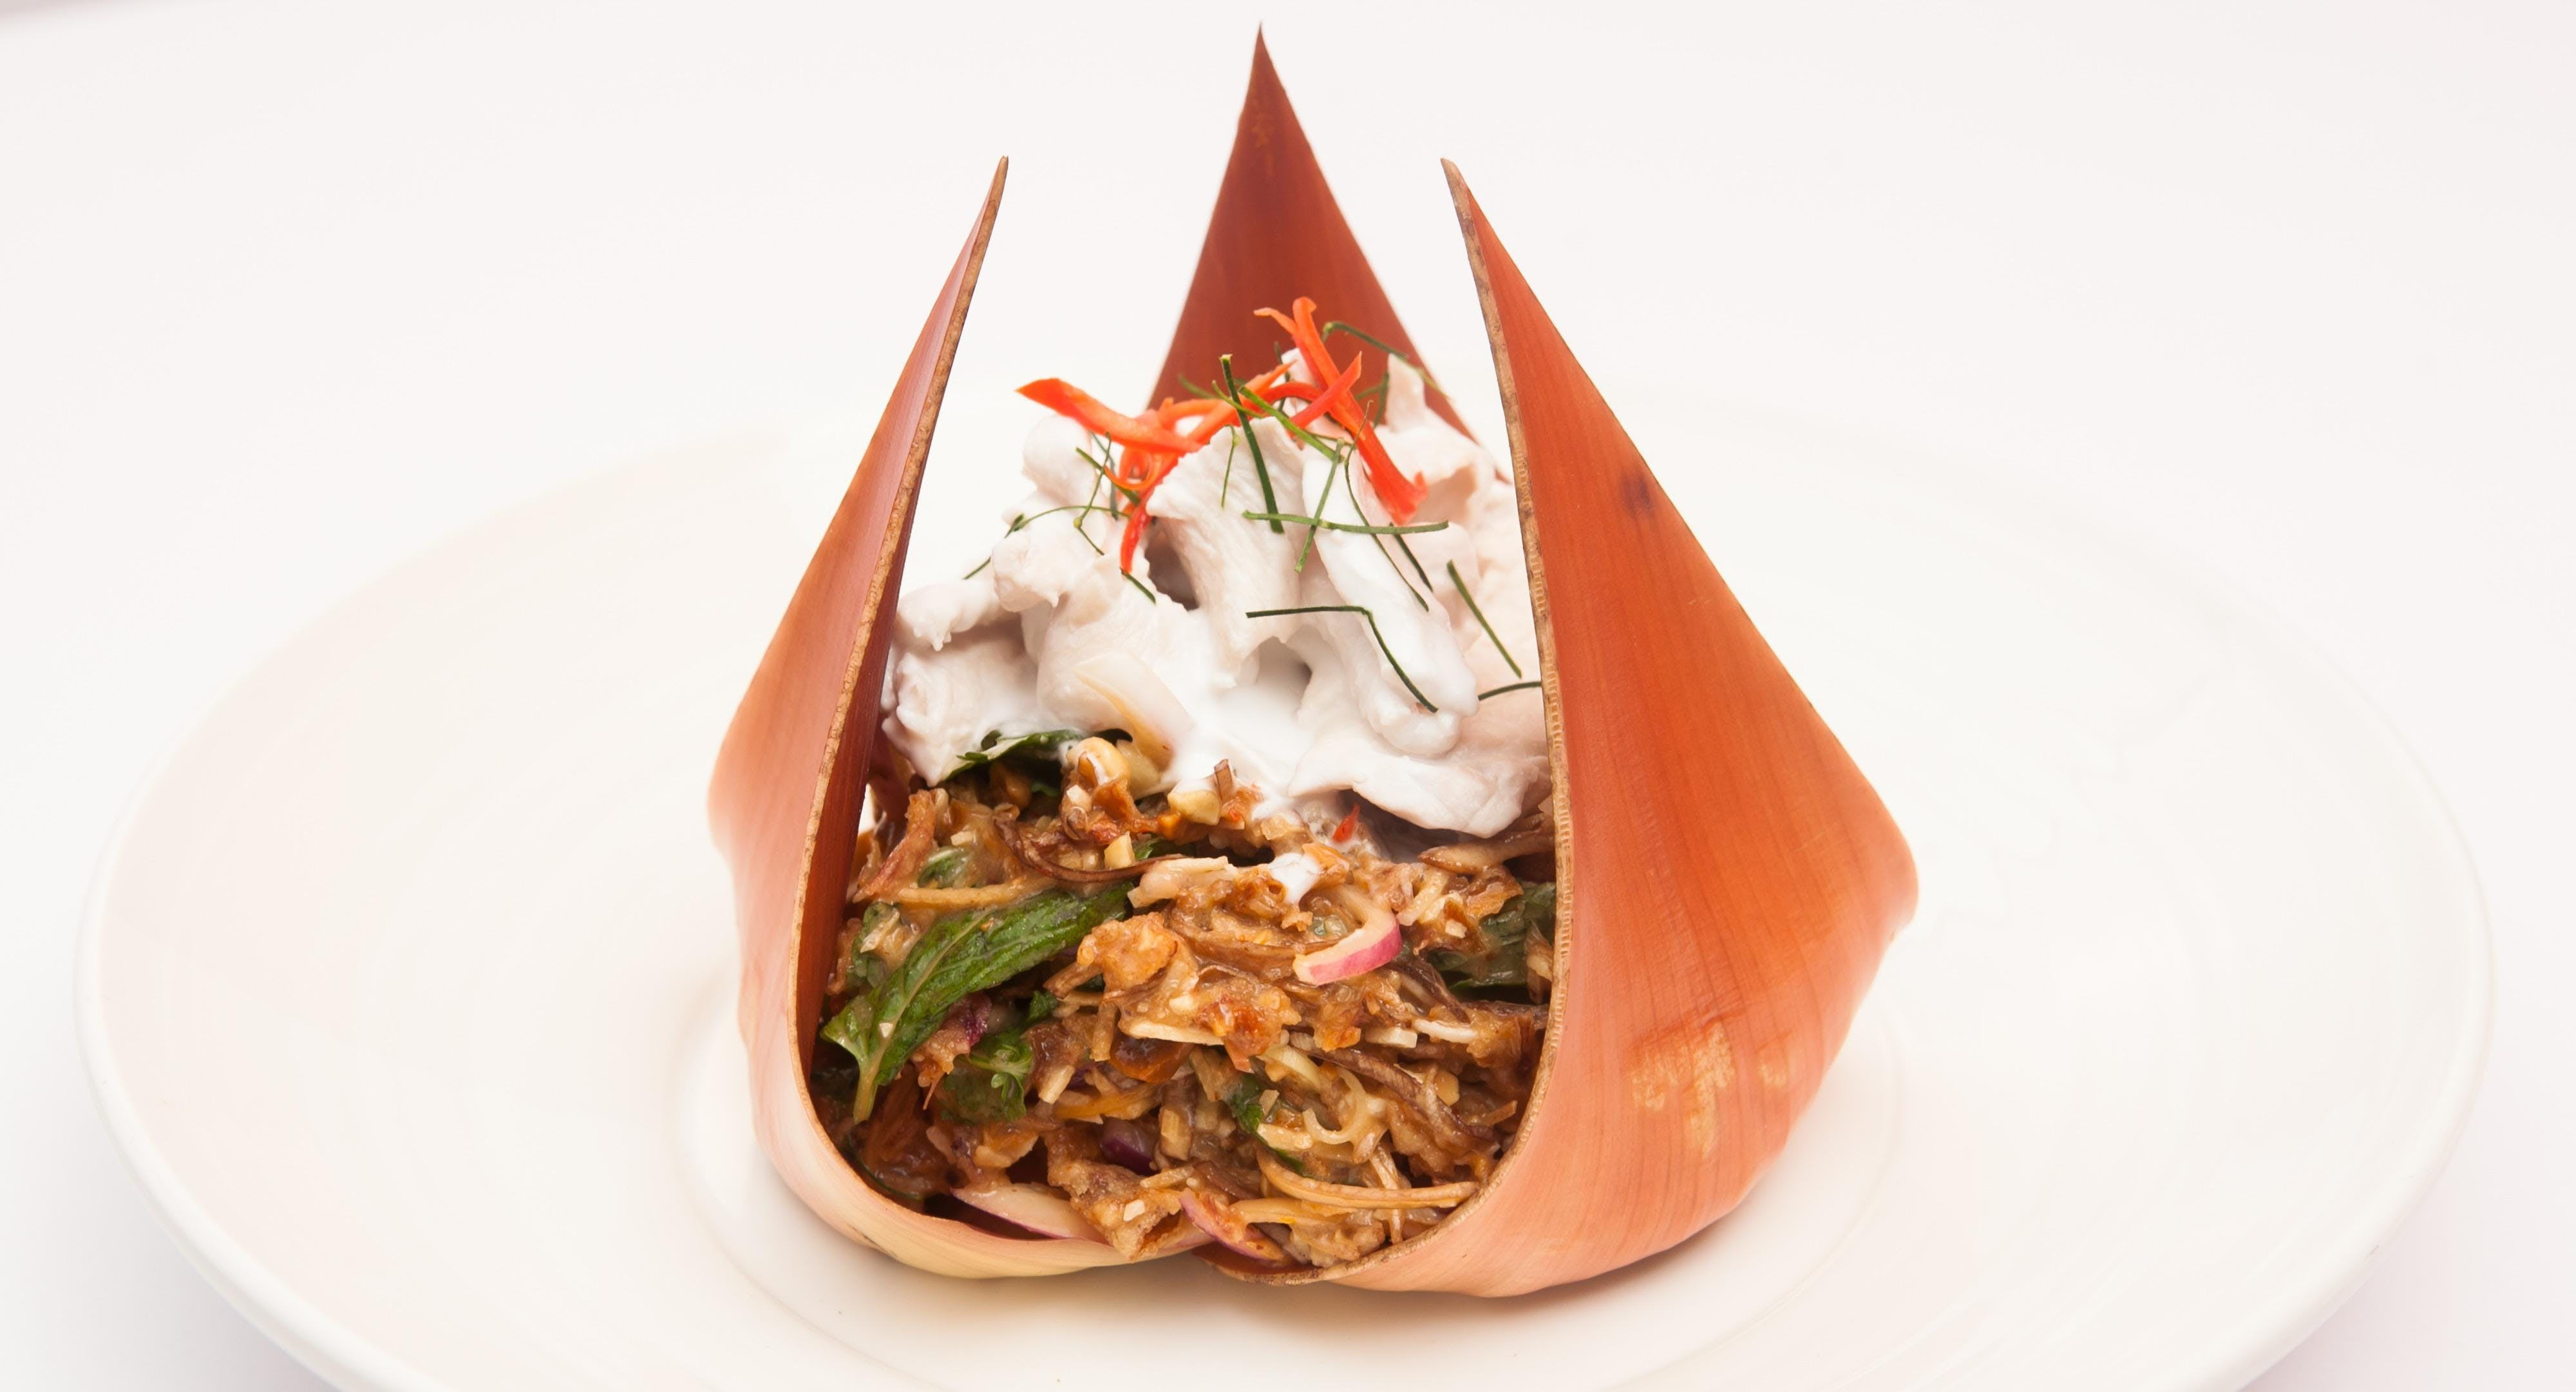 Photo of restaurant Manly Thai Gourmet in Manly, Sydney